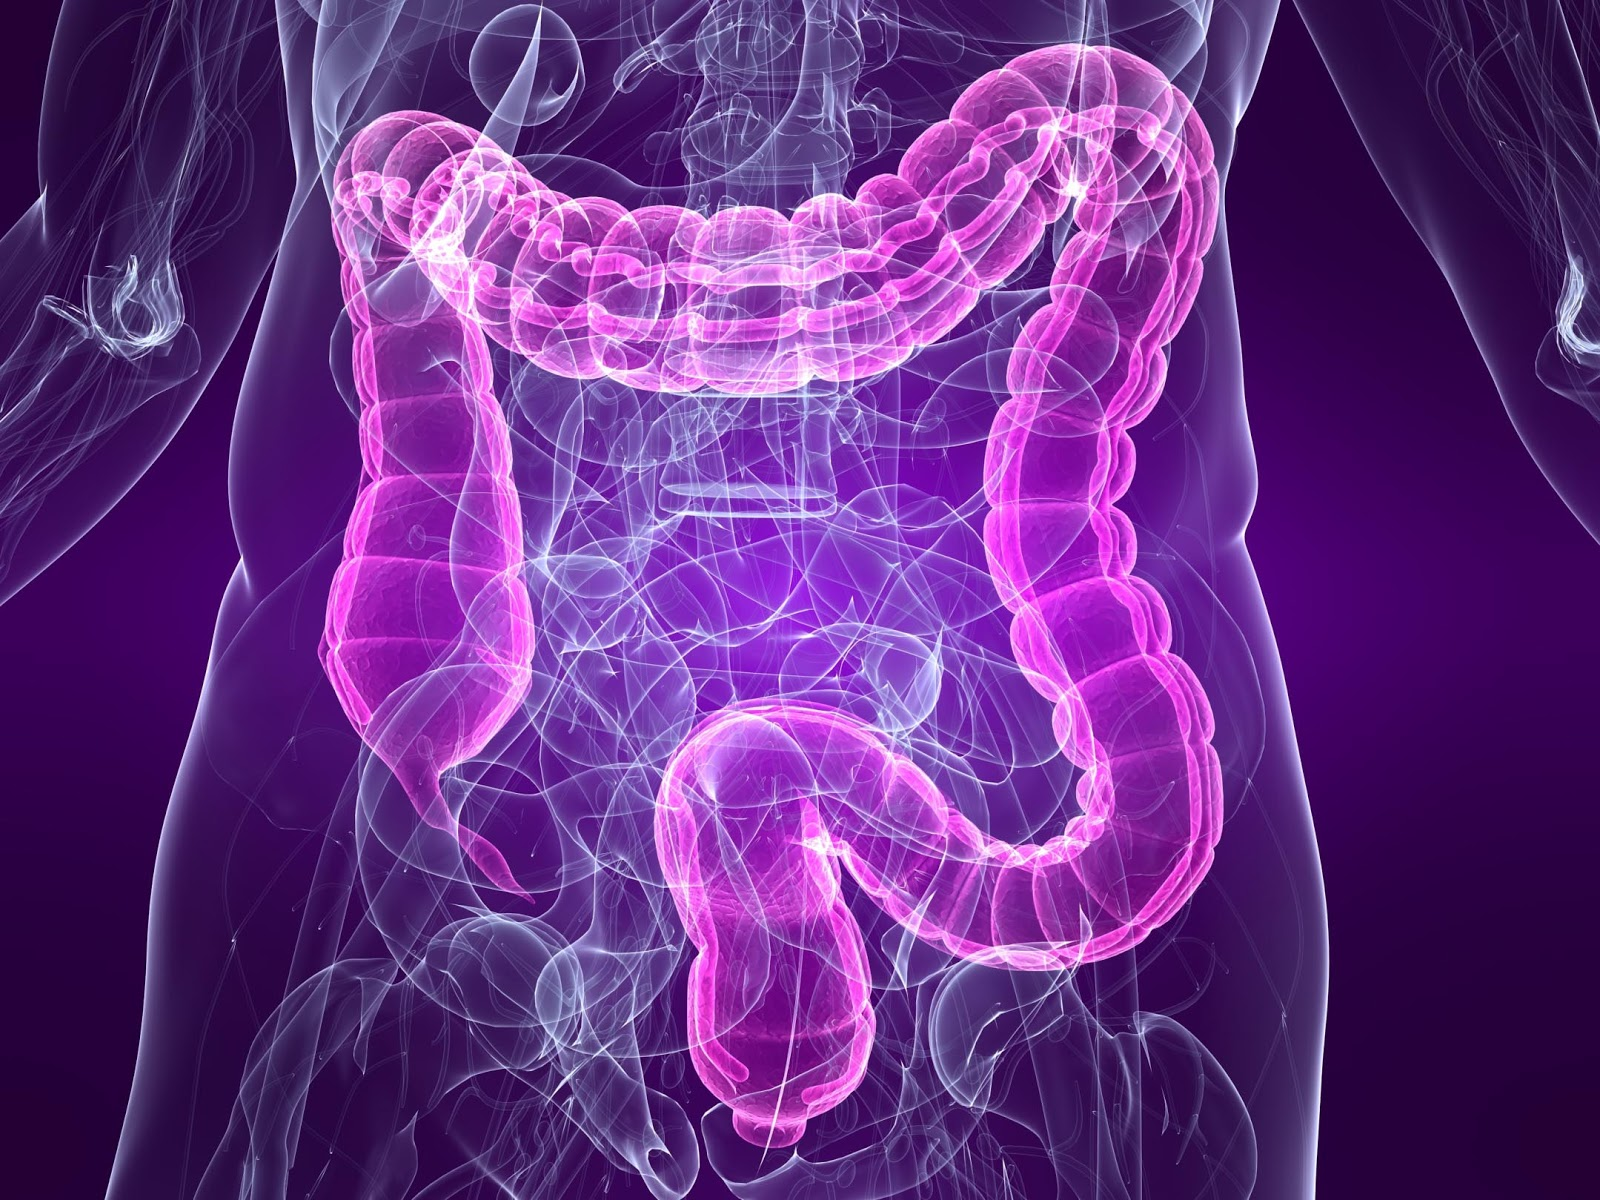 hight resolution of large intestine bowel diagram